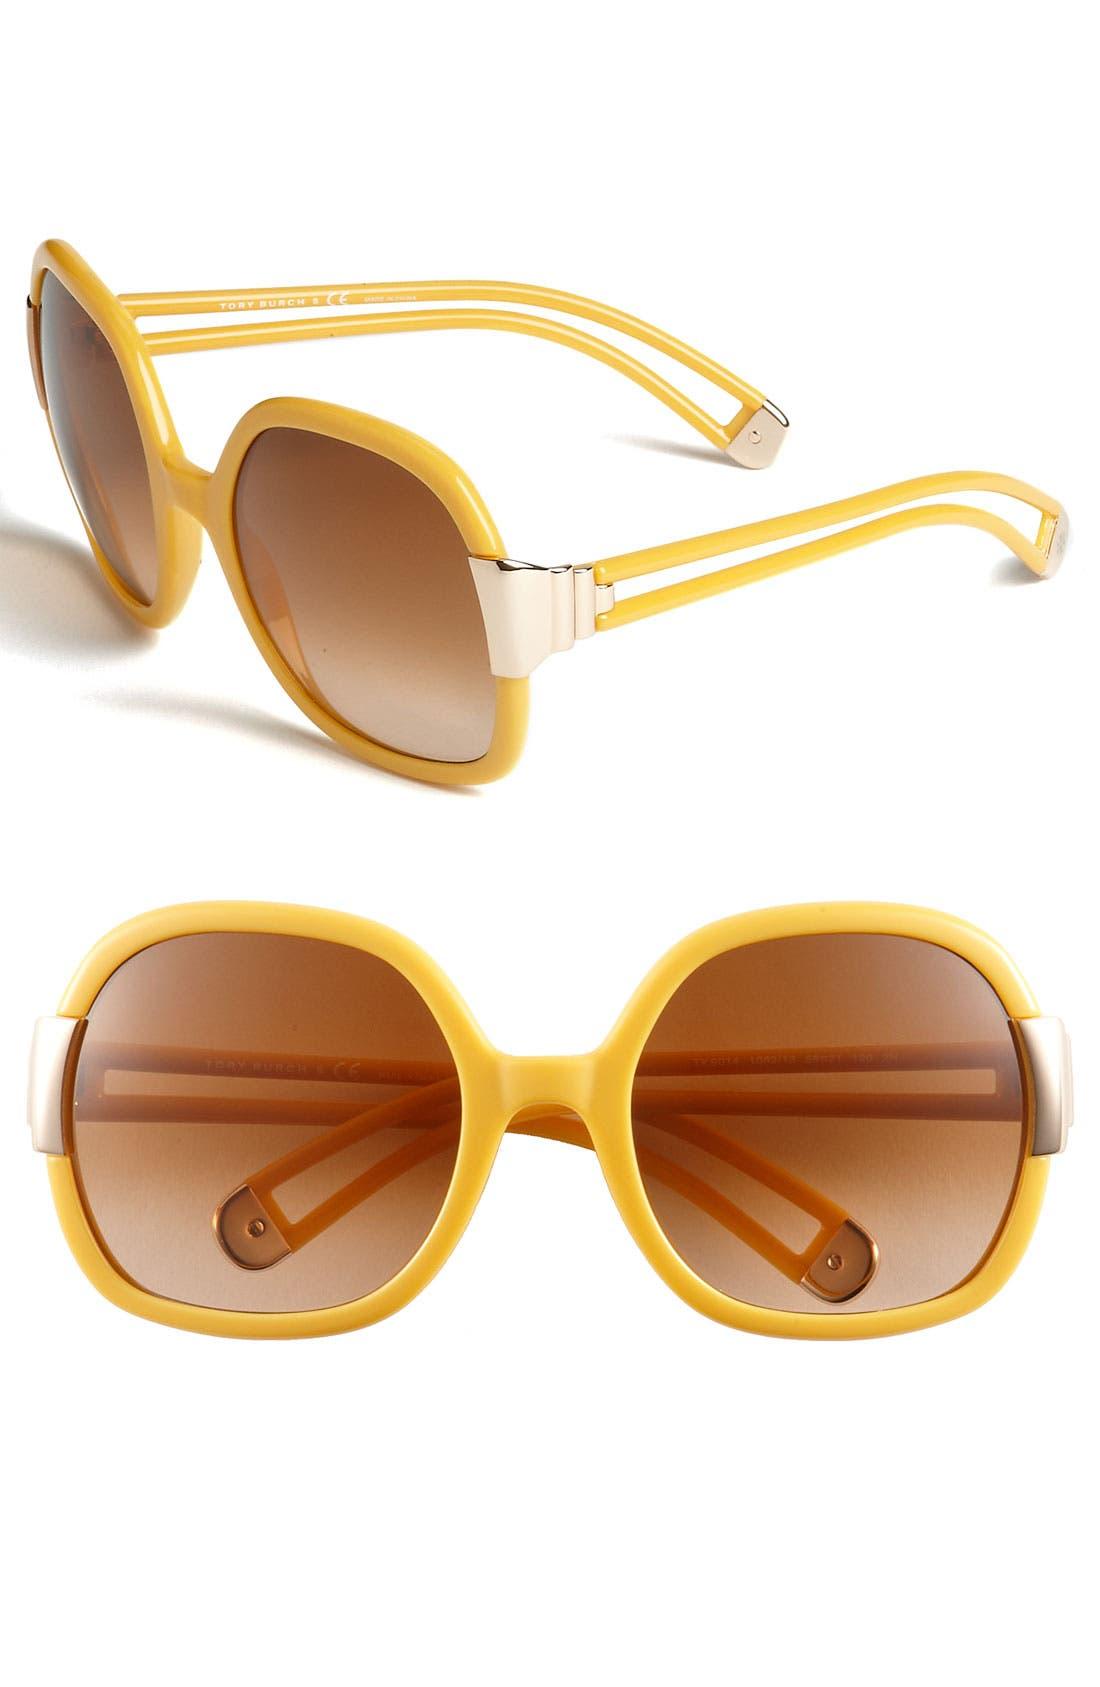 Alternate Image 1 Selected - Tory Burch 56mm Oversized Sunglasses